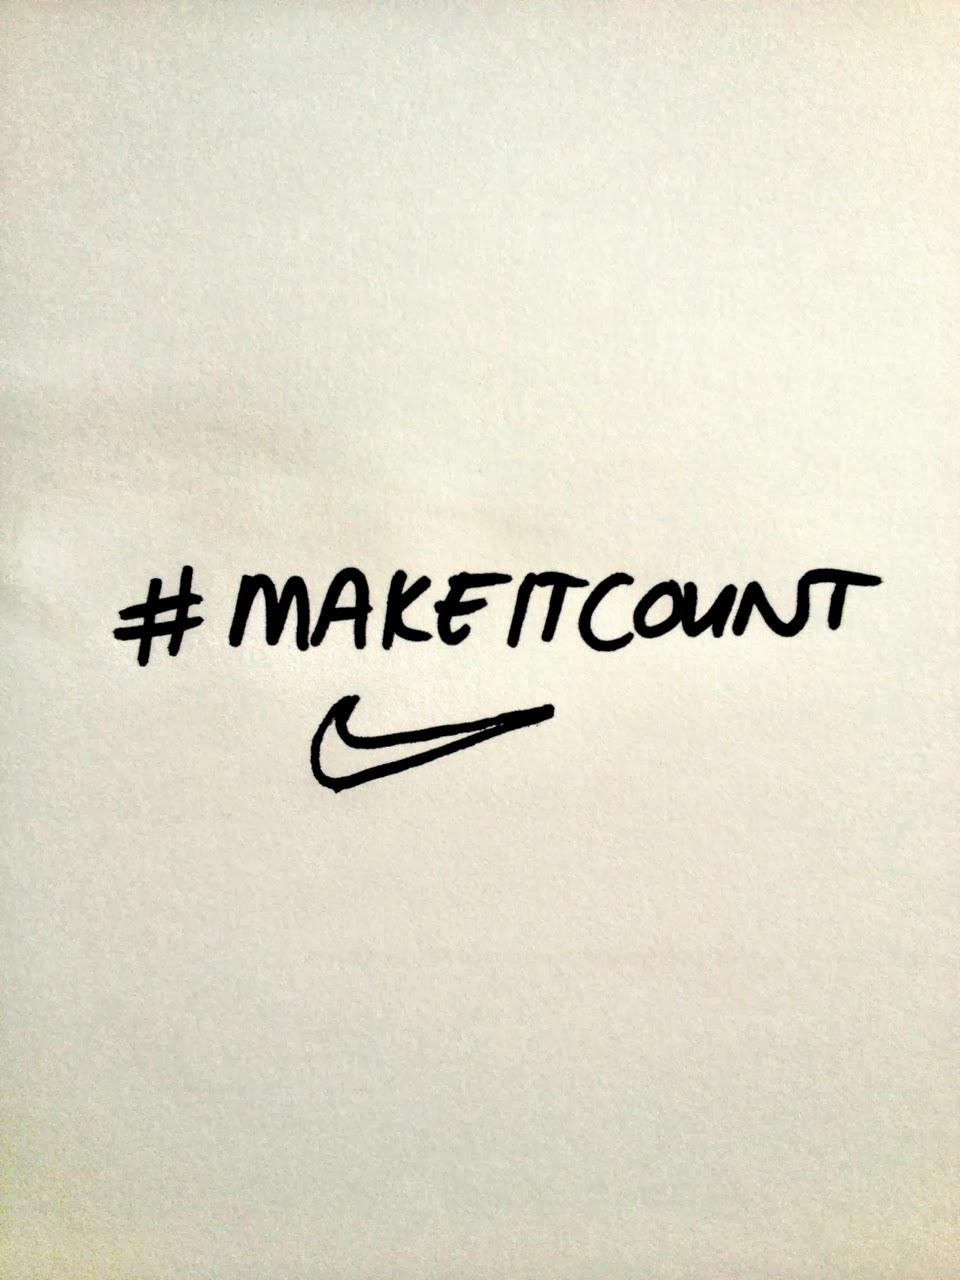 Motivation: If You Don't Make